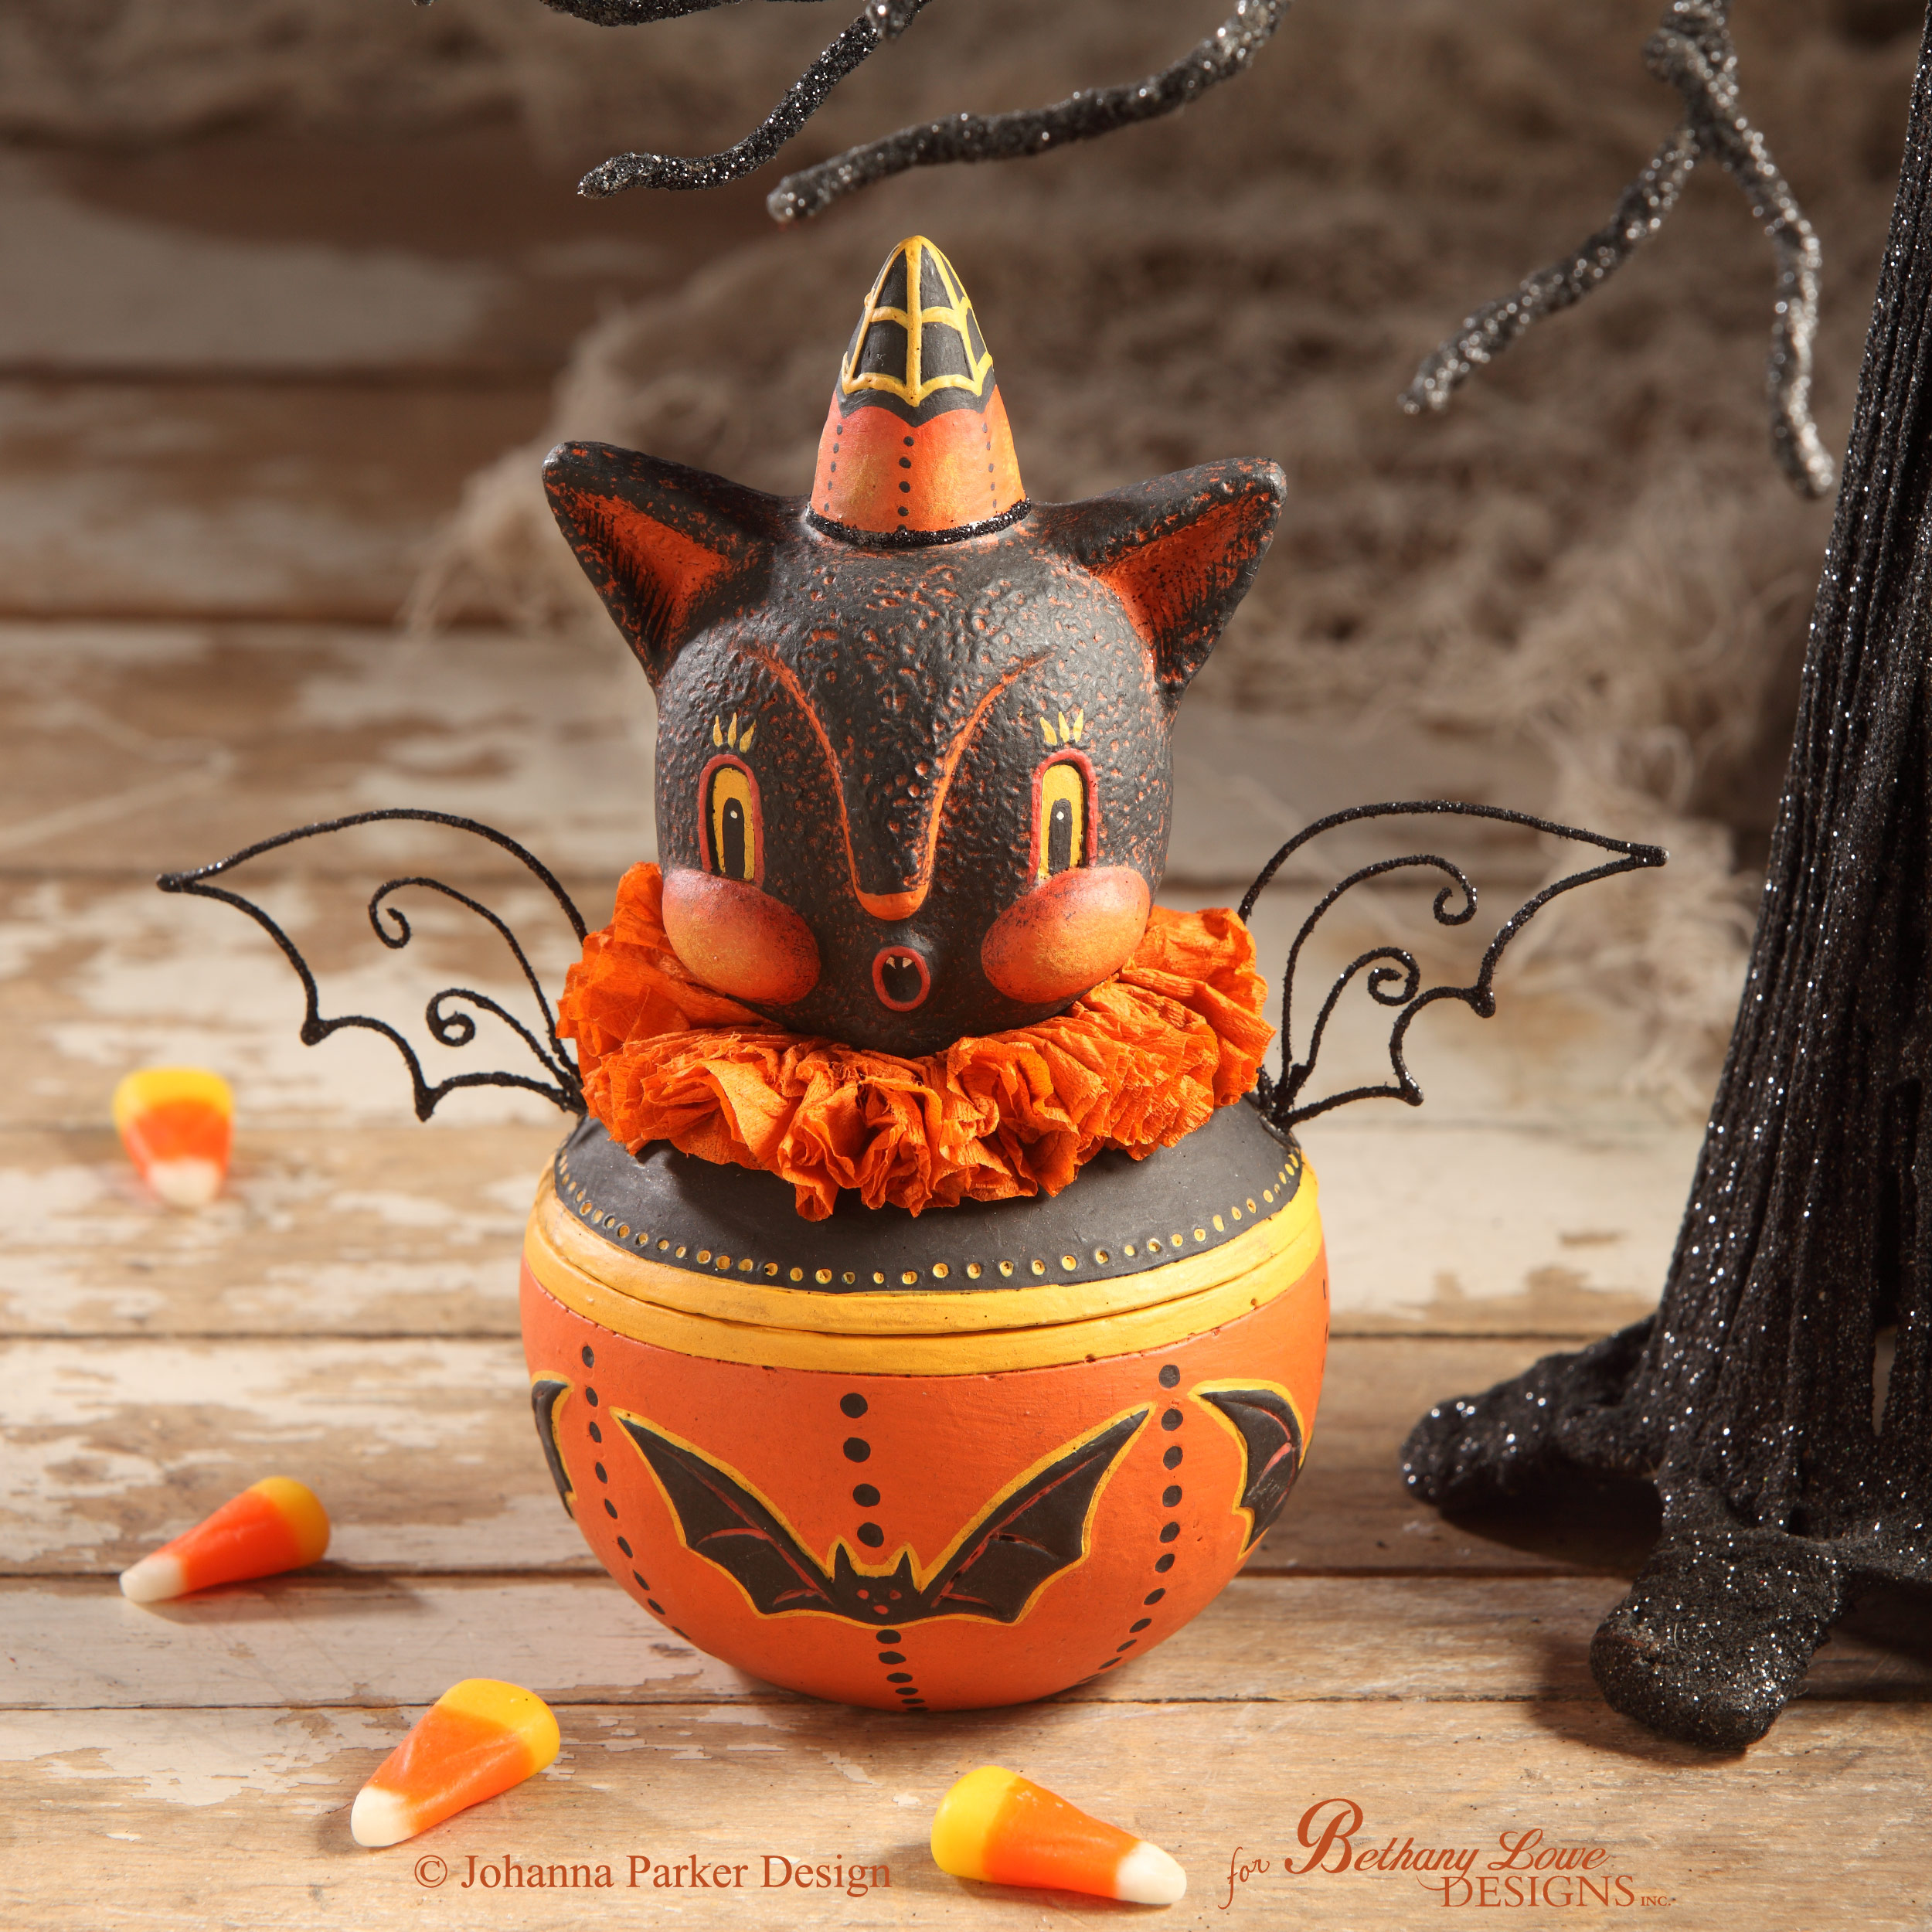 Johanna-Parker-Halloween-Bat-Bethany-Lowe.png